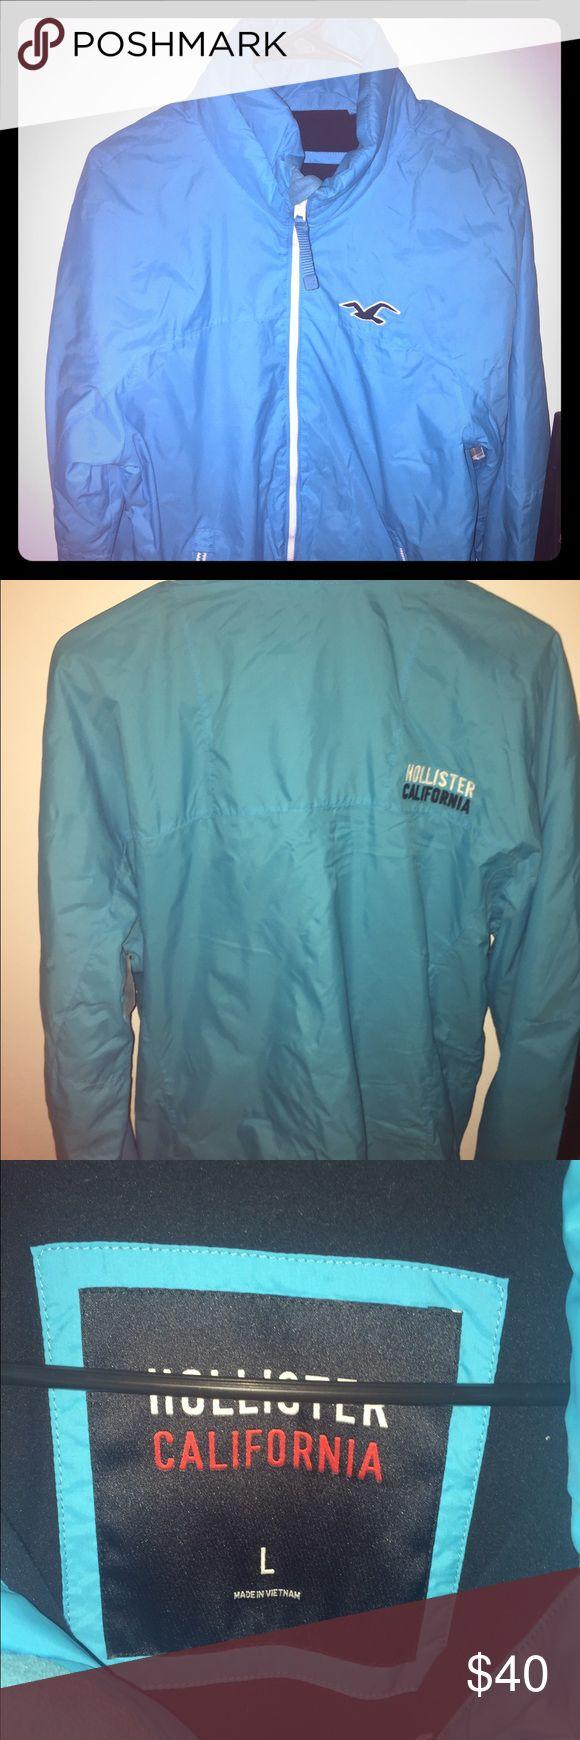 HOLLISTER JACKET !! Blue hollister jacket! Warm & cozy! Fits m/l Hollister Jackets & Coats